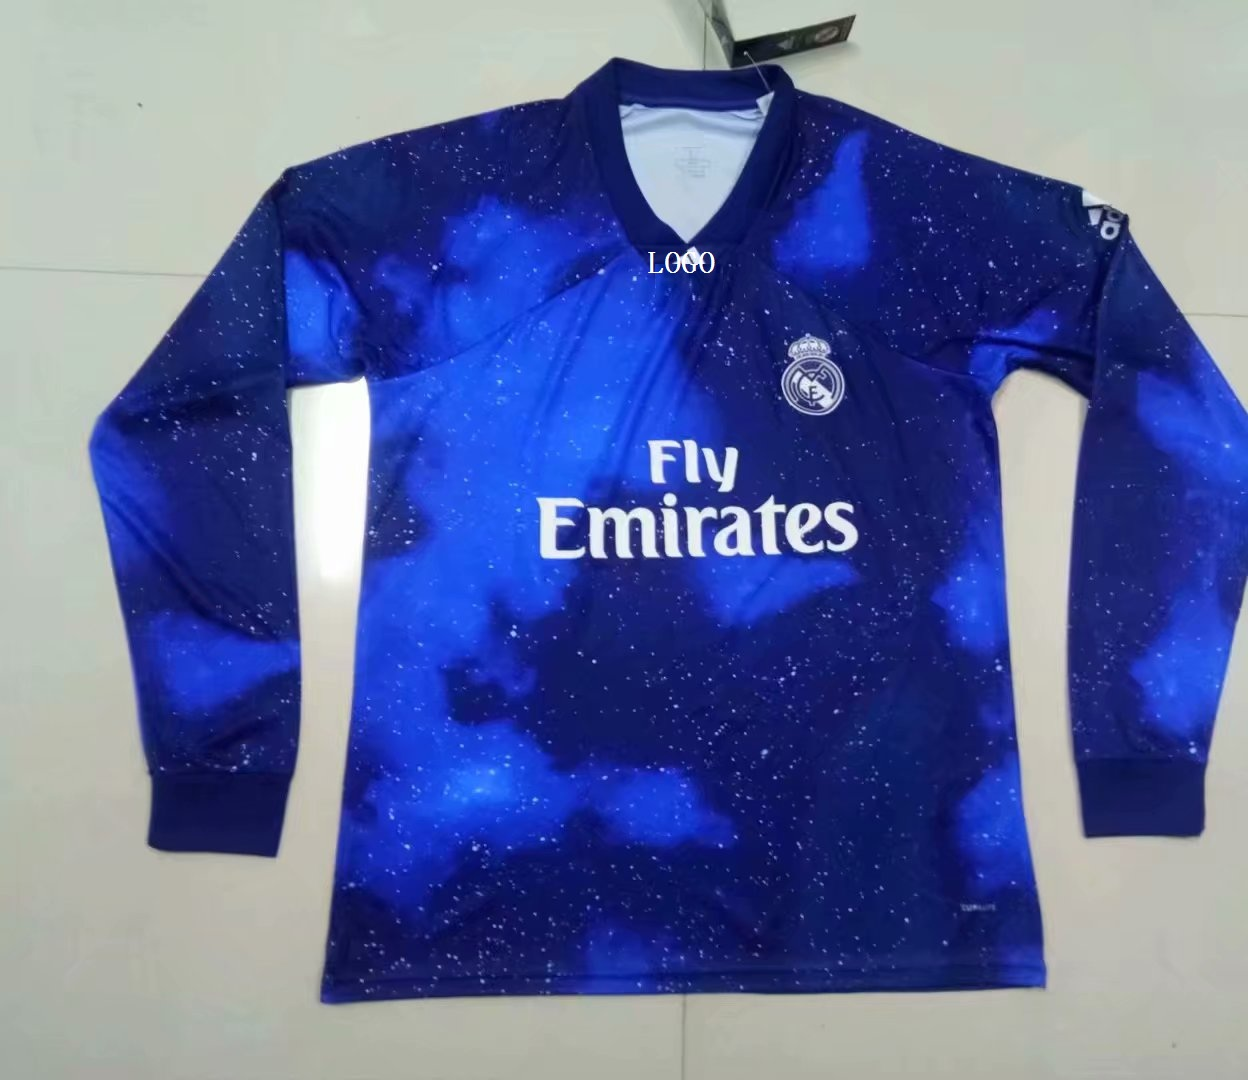 34e8b629ed7 2018 19 Adult Real Madrid EA Sports long sleeve soccer jersey football shirt  Item NO  566290